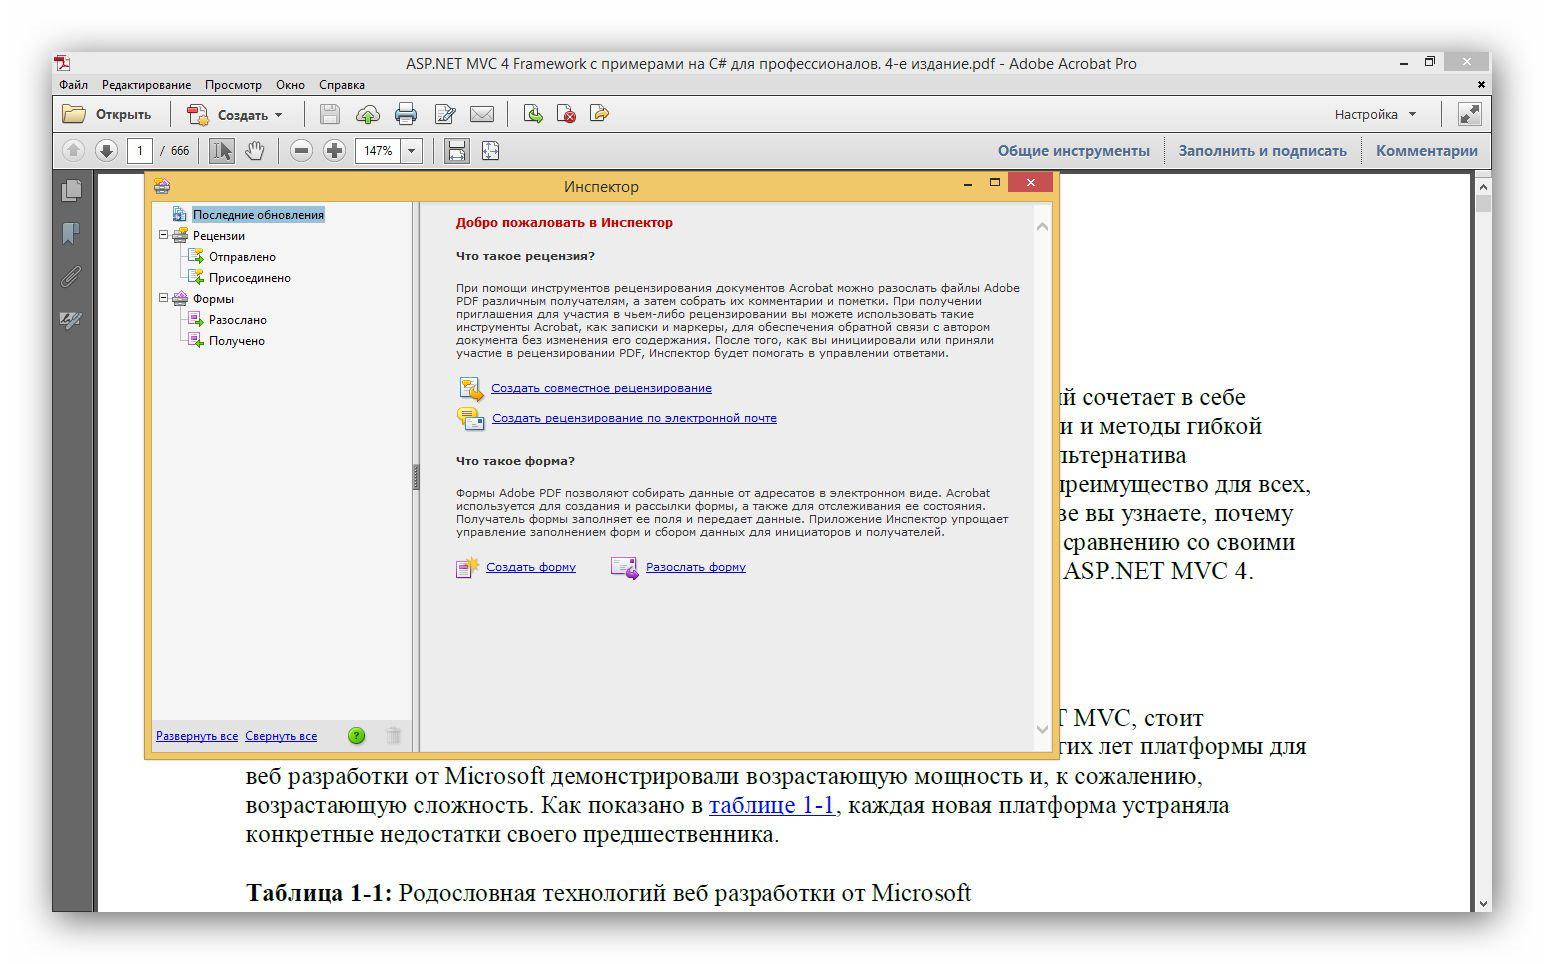 Ebook download reader acrobat adobe 2.1.